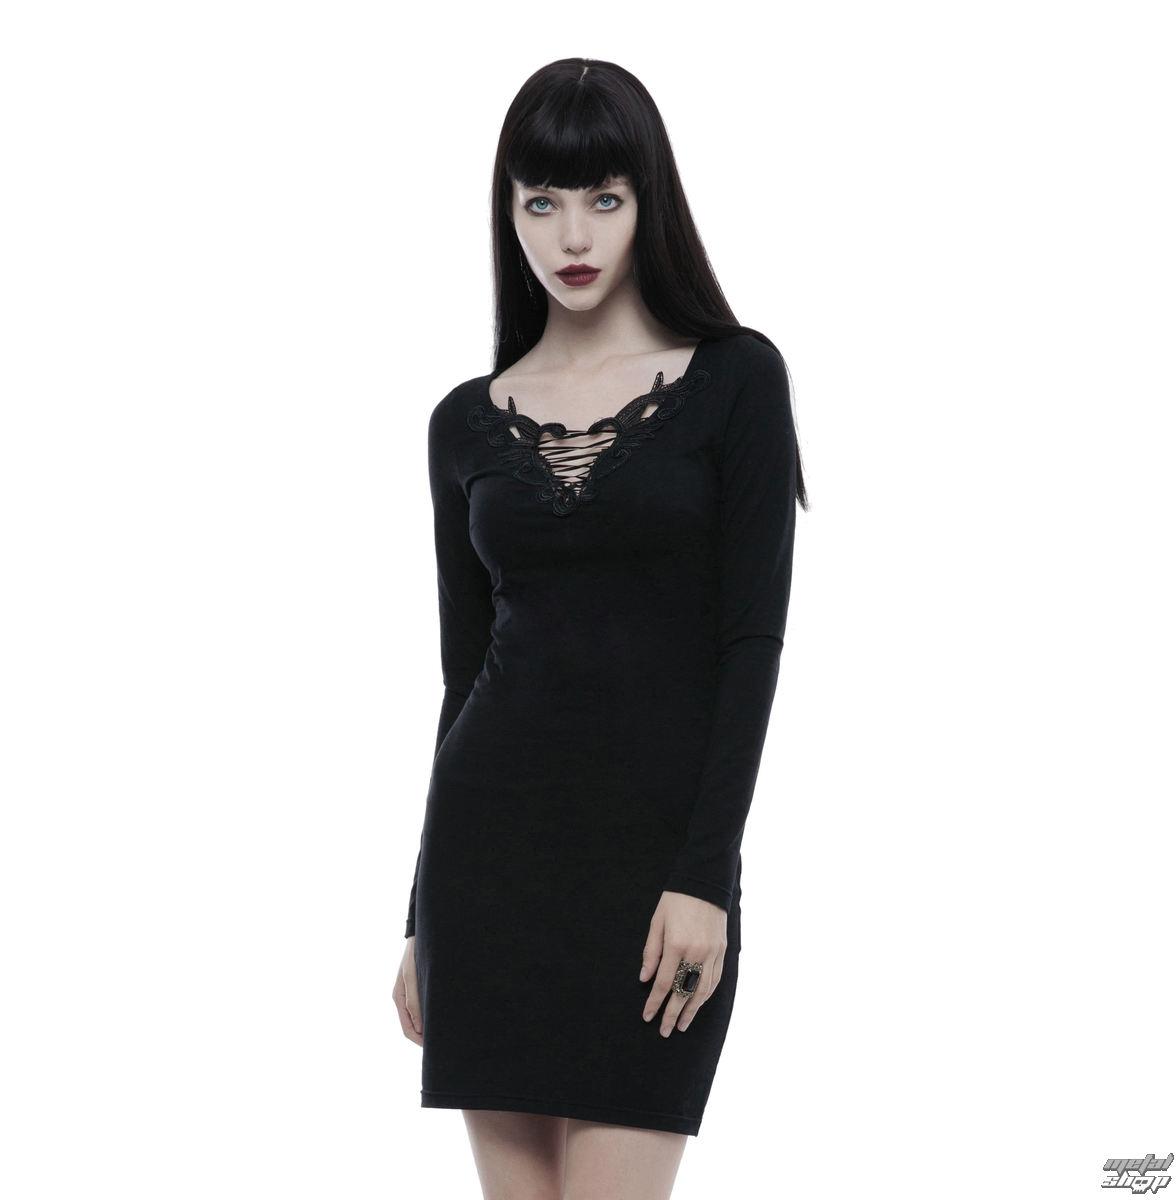 Damen Kleid PUNK RAVE - Serena - WQ-343/BK - metalshop.de